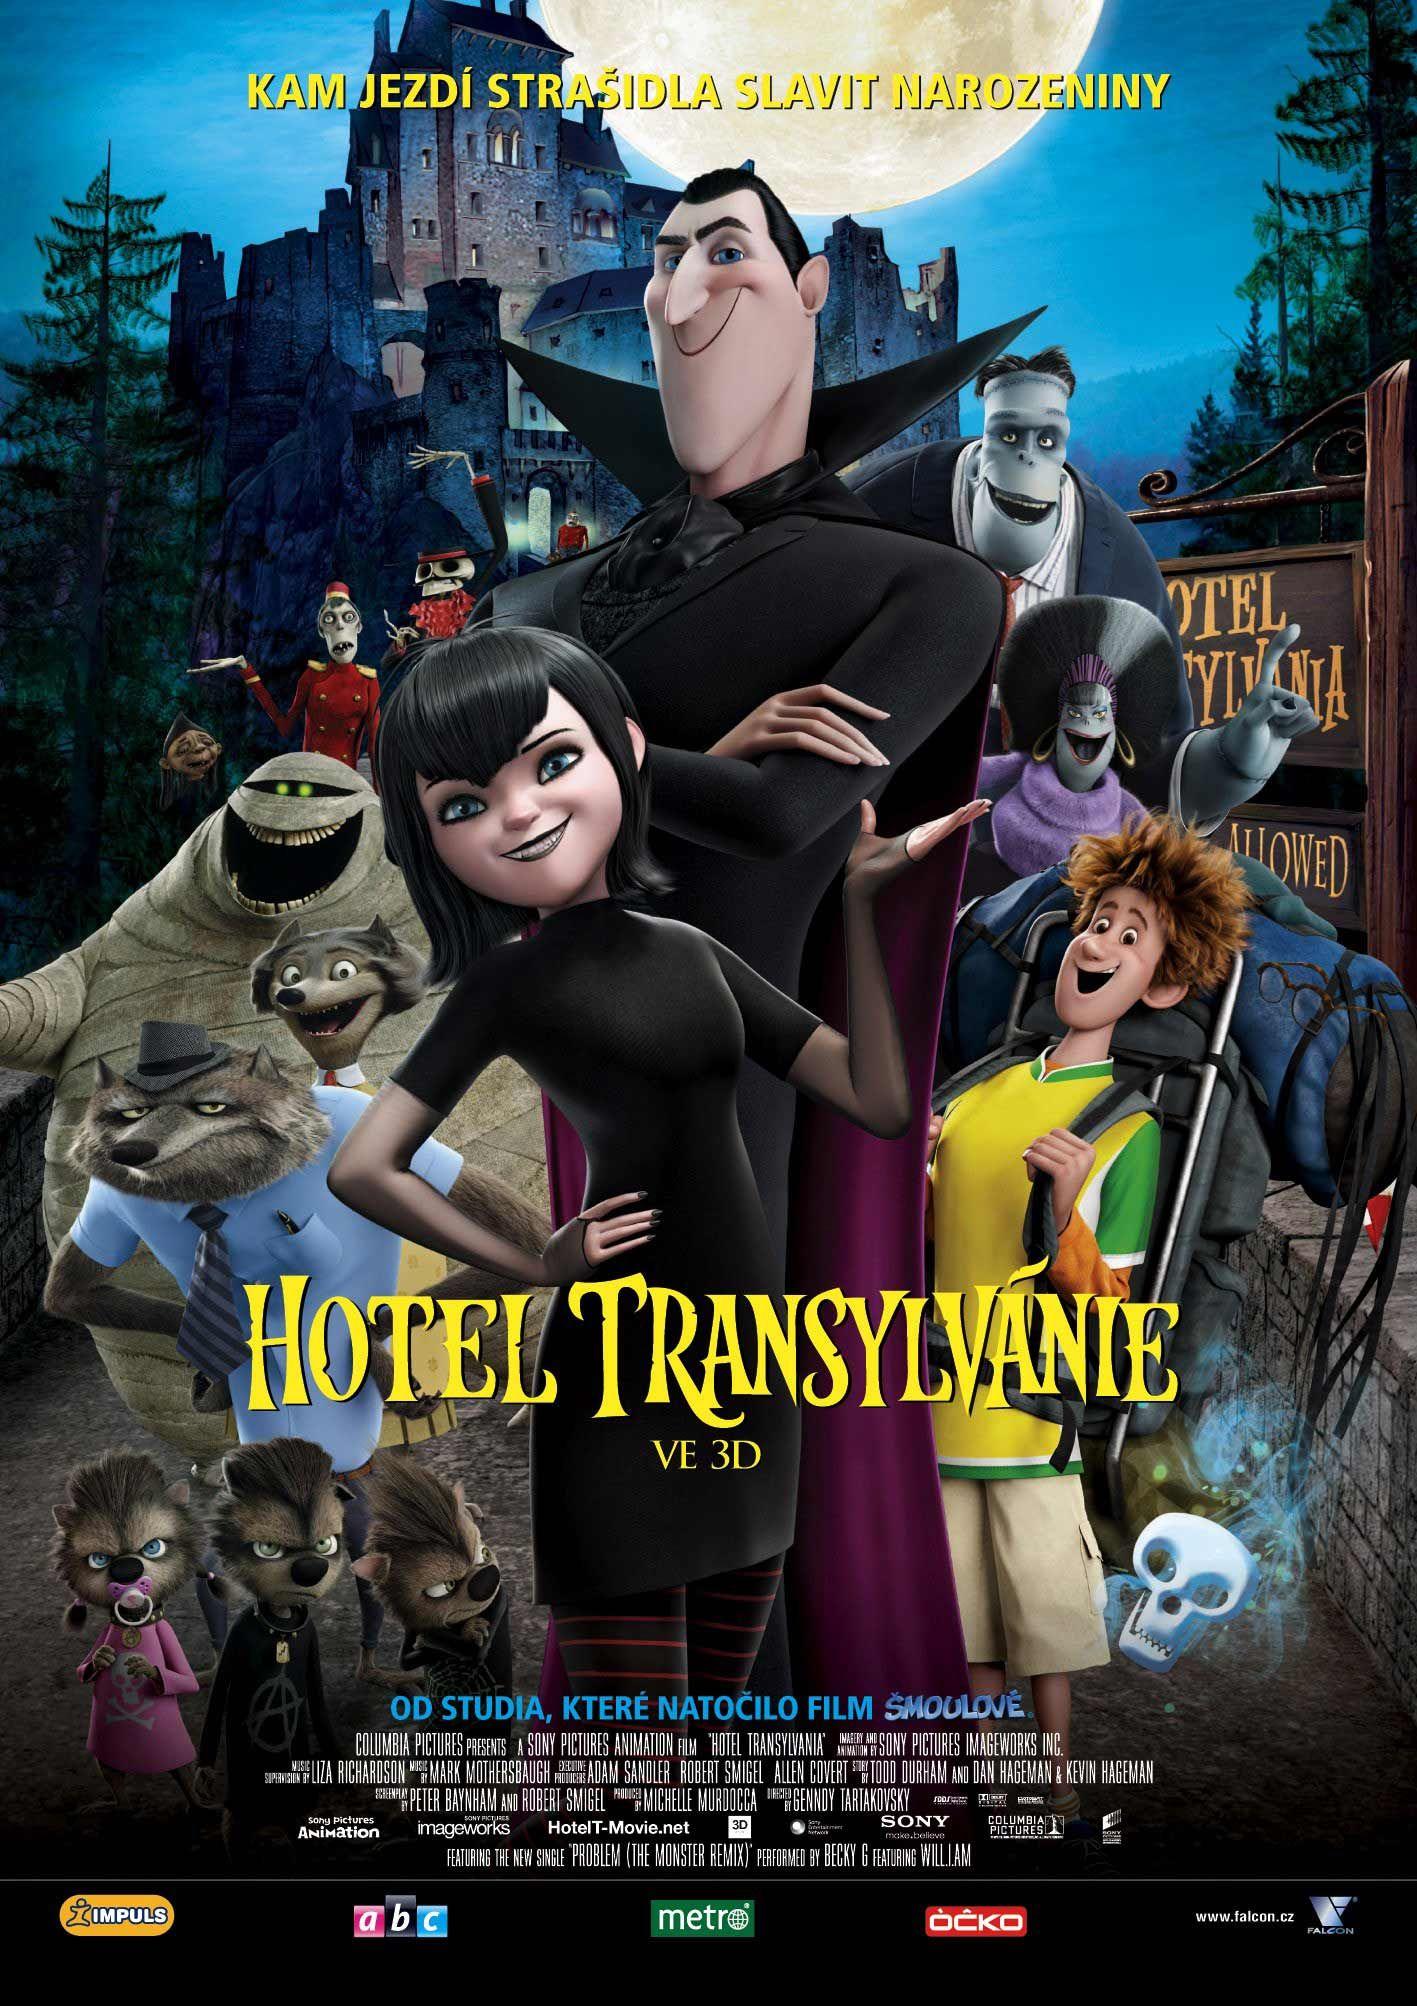 Hotel Transylvanie 1 Streaming : hotel, transylvanie, streaming, Hotel, Transylvania, (2012), Czech, Poster, Movie,, Transylvania,